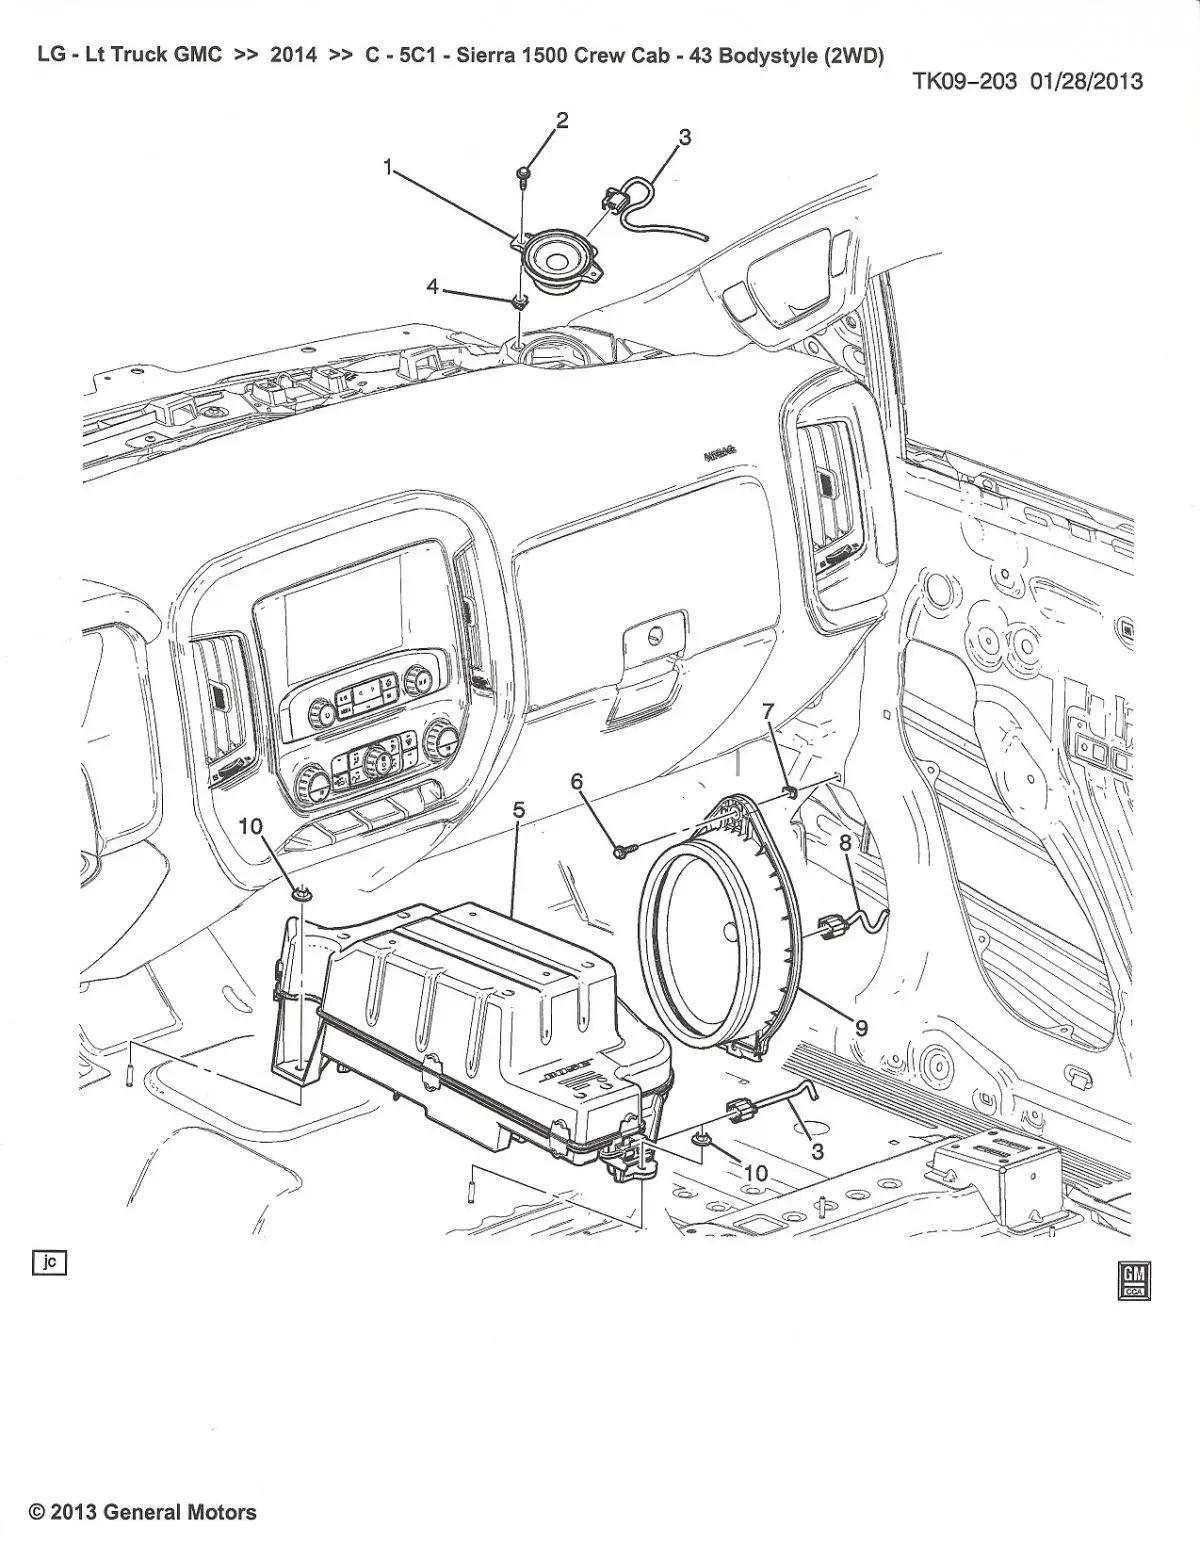 2014 silverado door speaker wire diagram share the knownledge